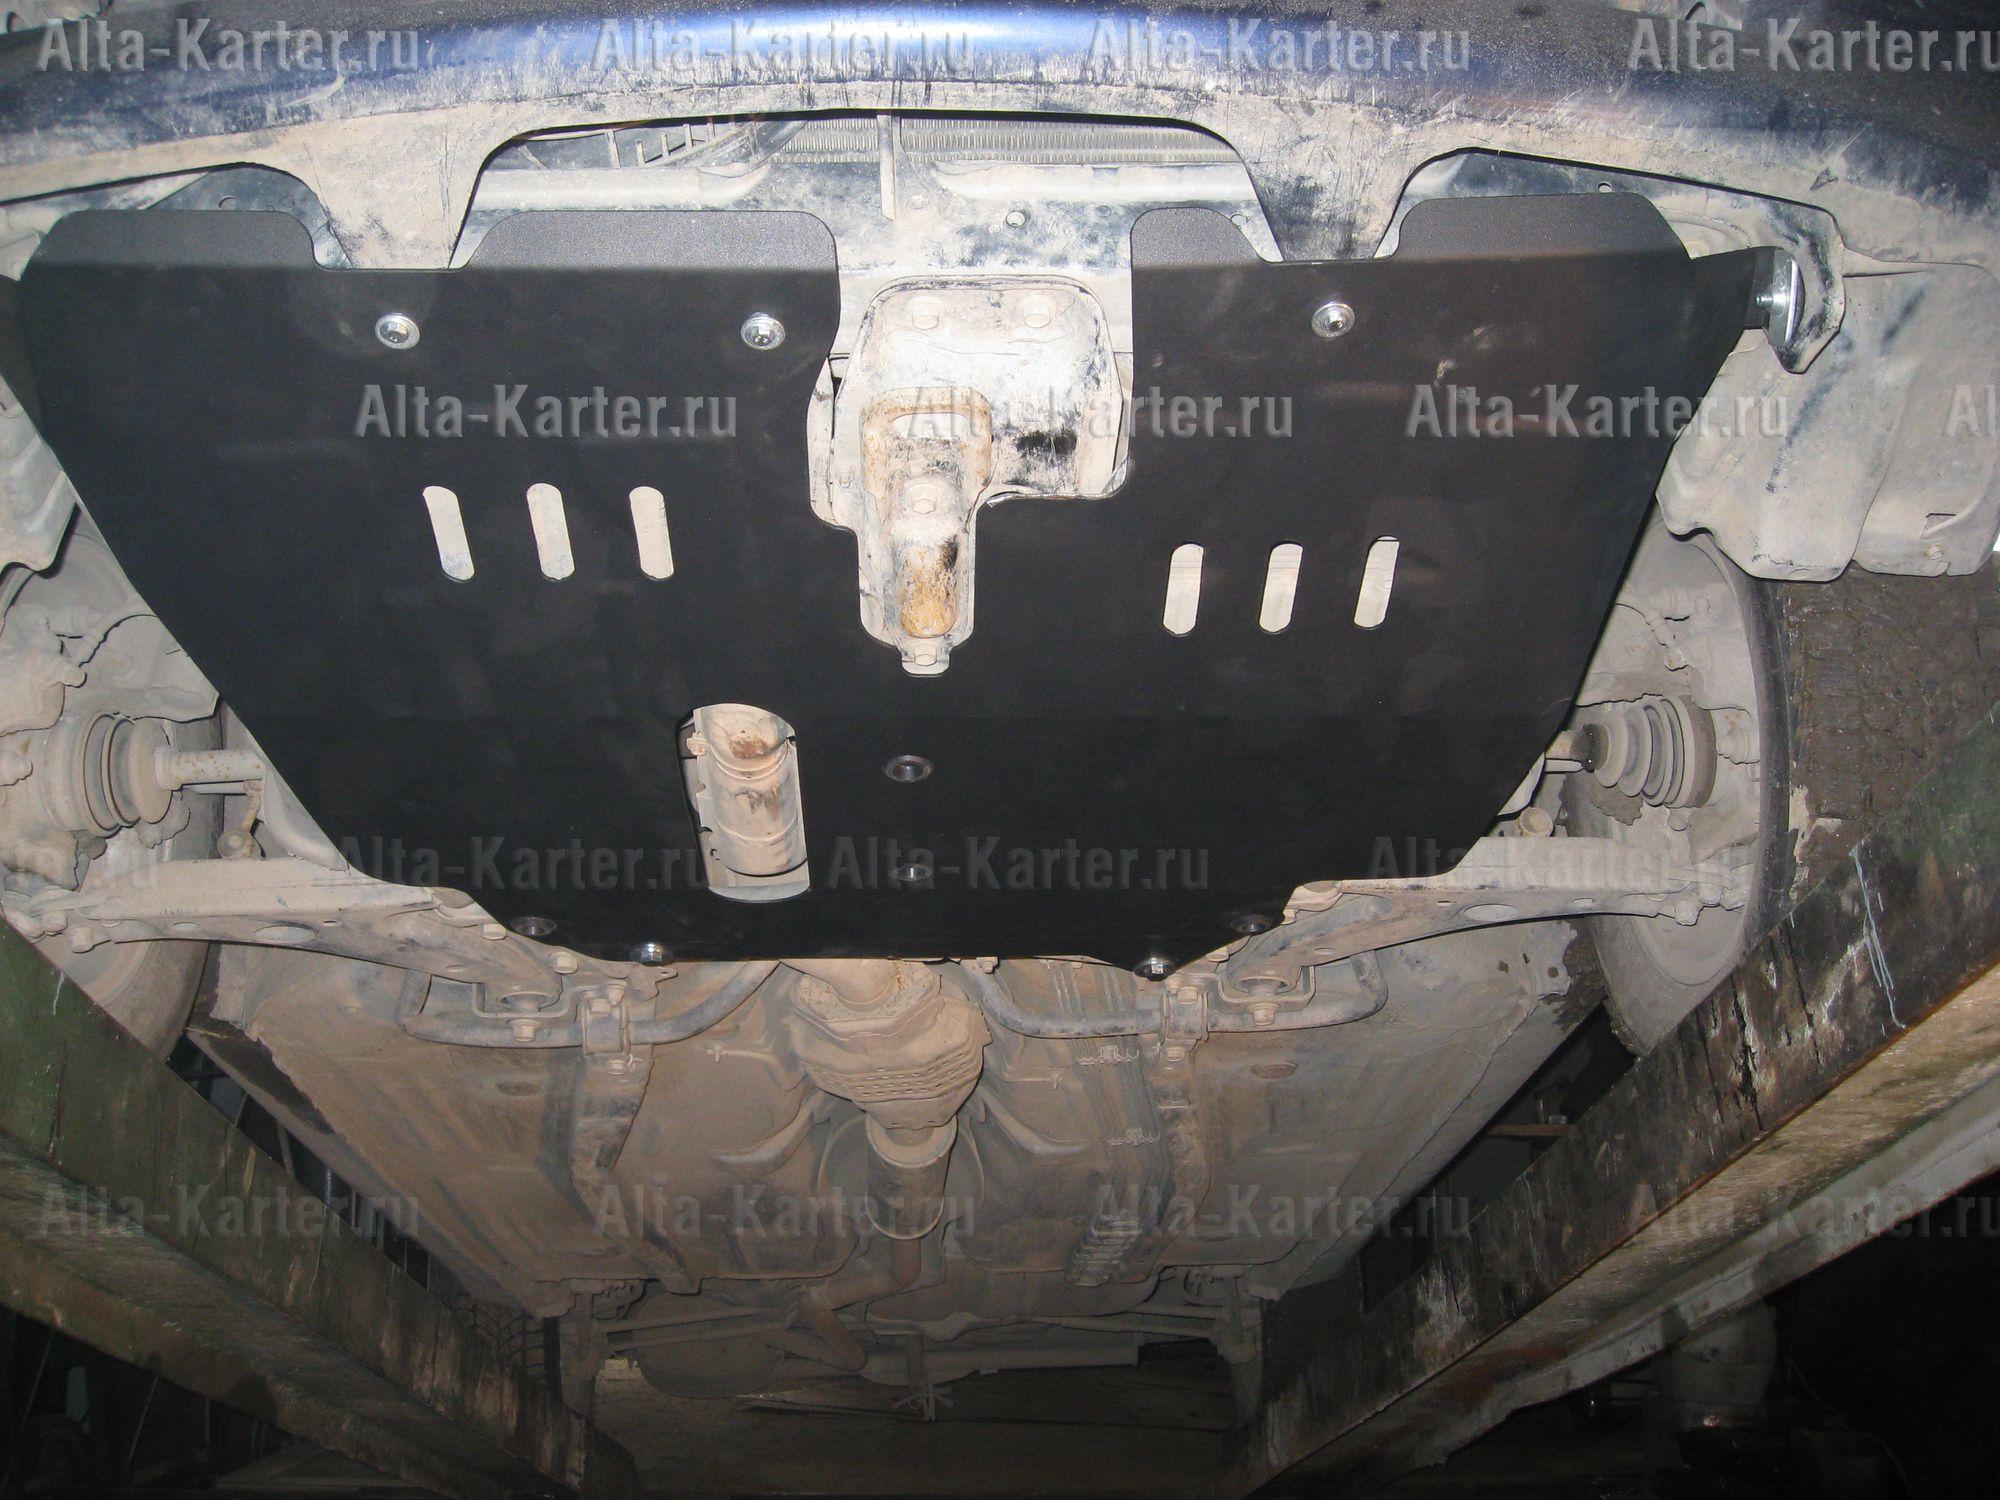 Защита Alfeco для картера и КПП Toyota Corolla Spacio E110 1997-2001. Артикул ALF.24.32